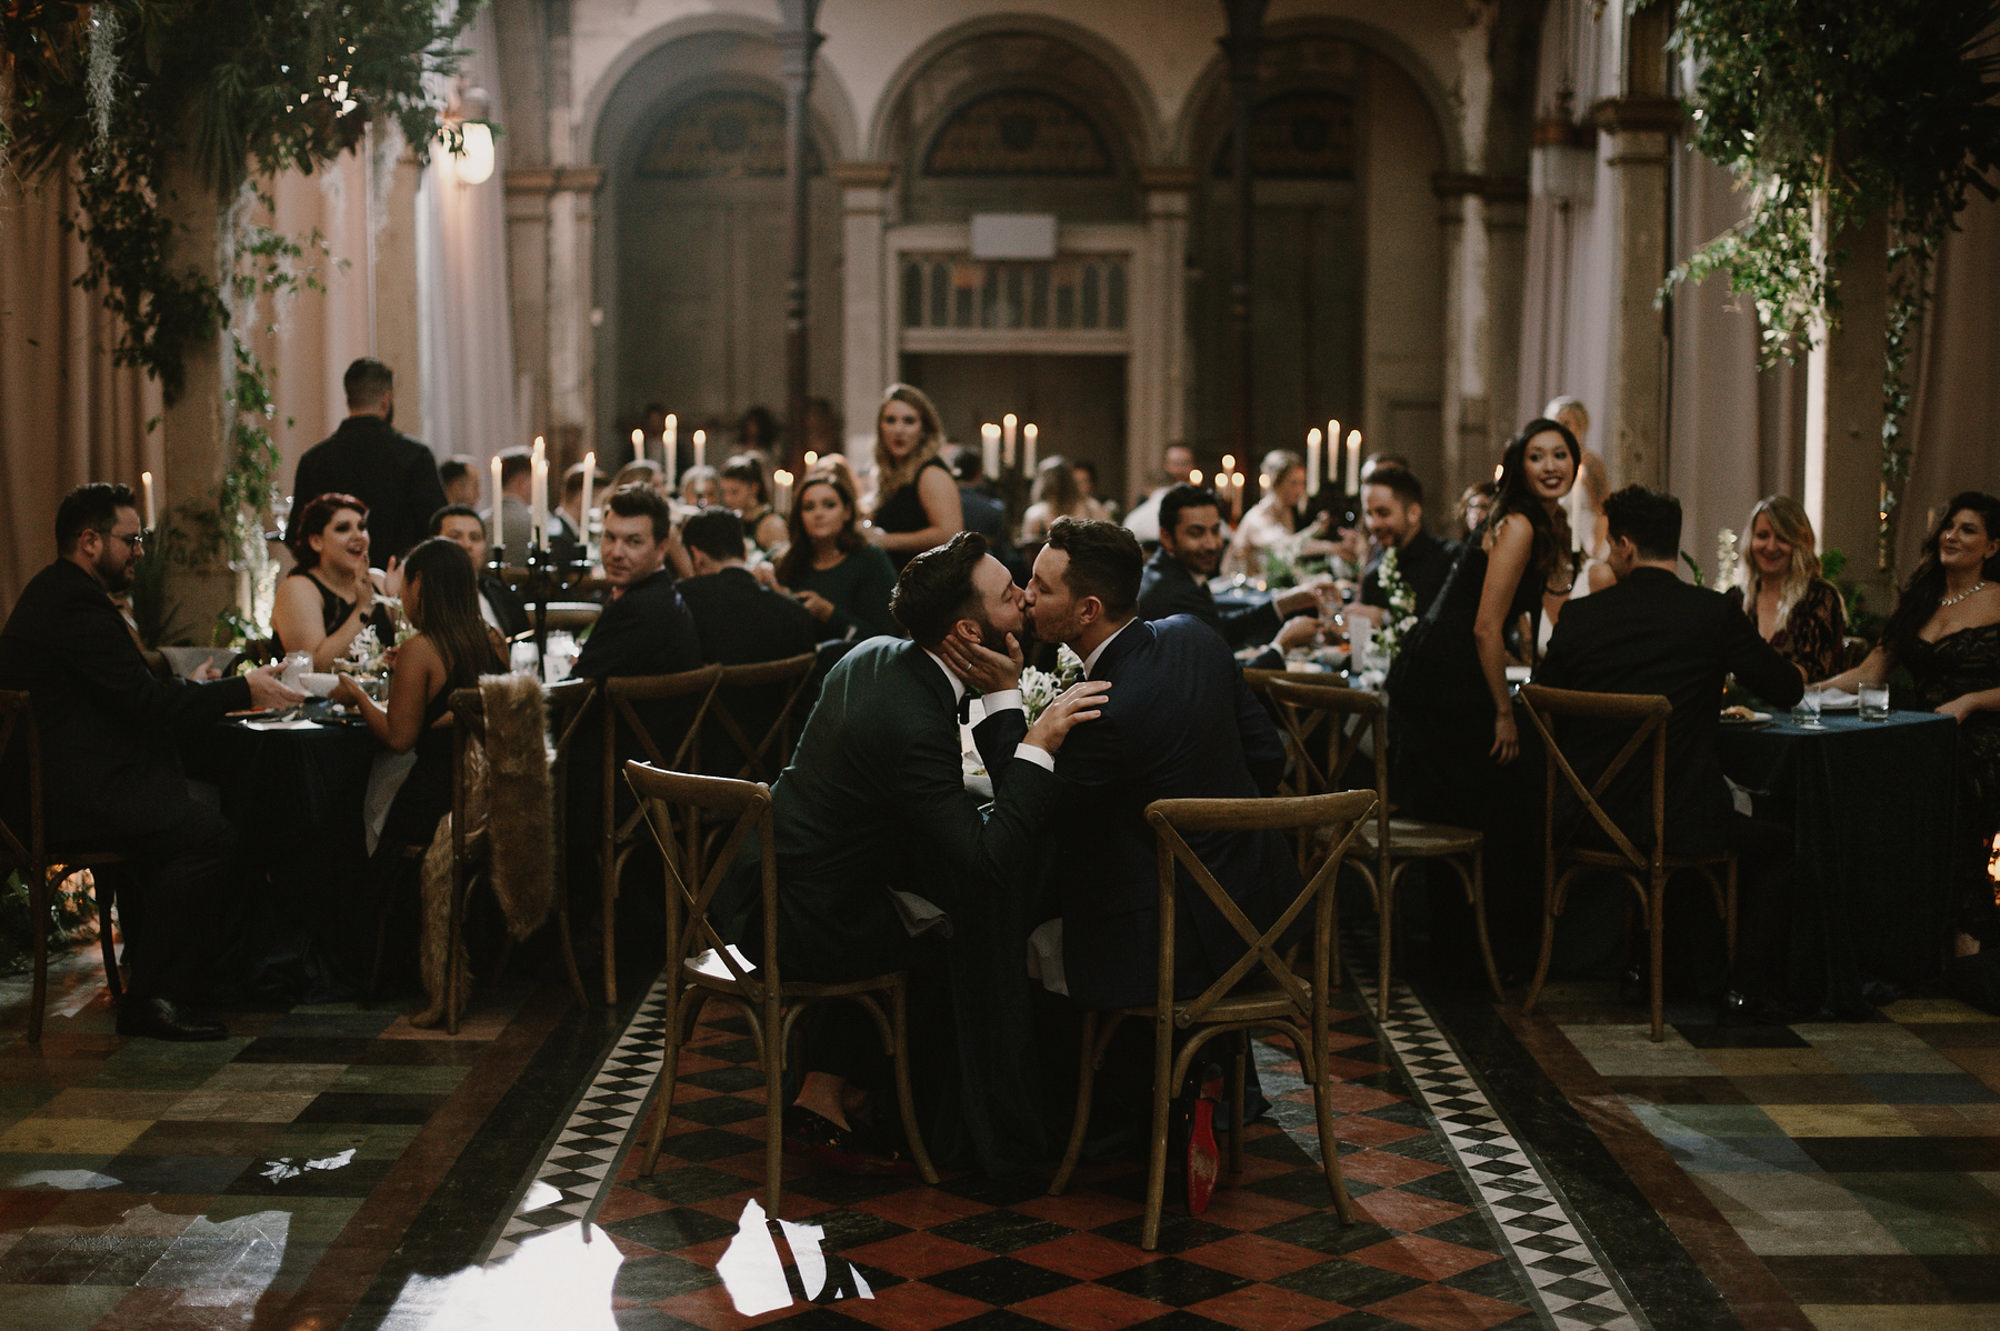 grooms-kiss-each-other-at-elegant-tiled-venue-worlds-best-wedding-photographers-kristen-marie-parker-seattle-wedding-photographers